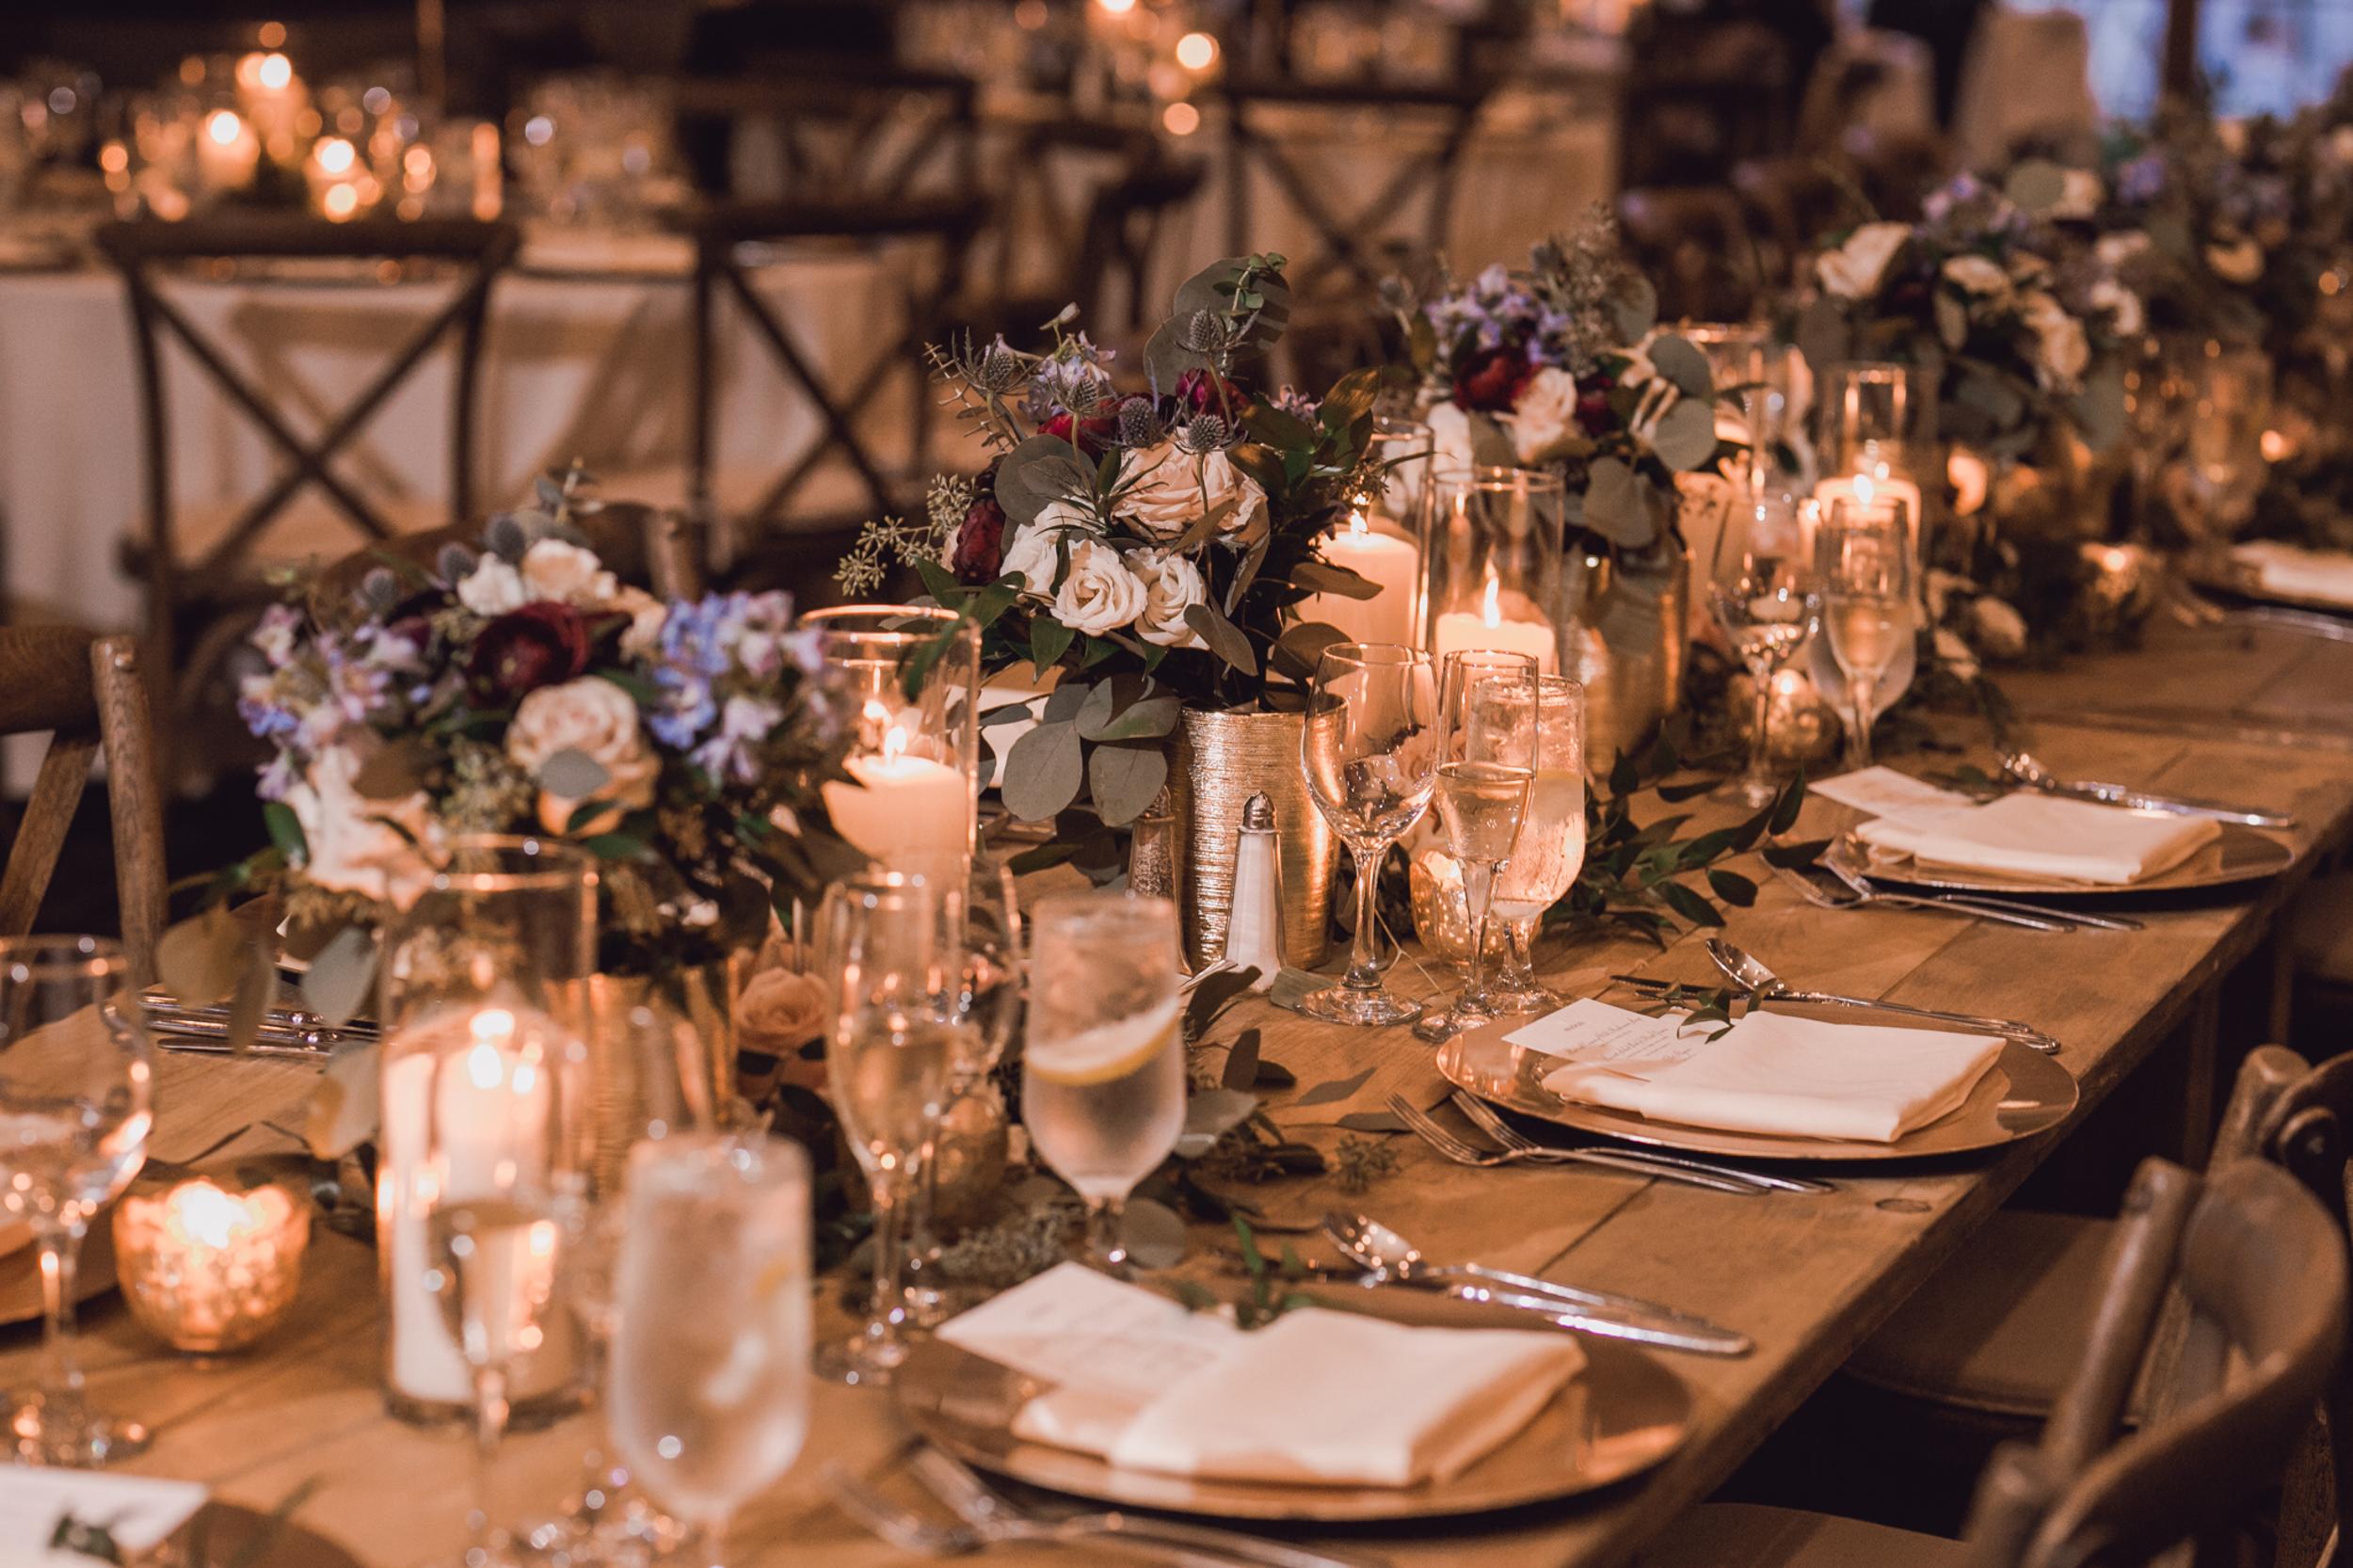 wedding-photography-dark-moody-rustic-details-38.jpg